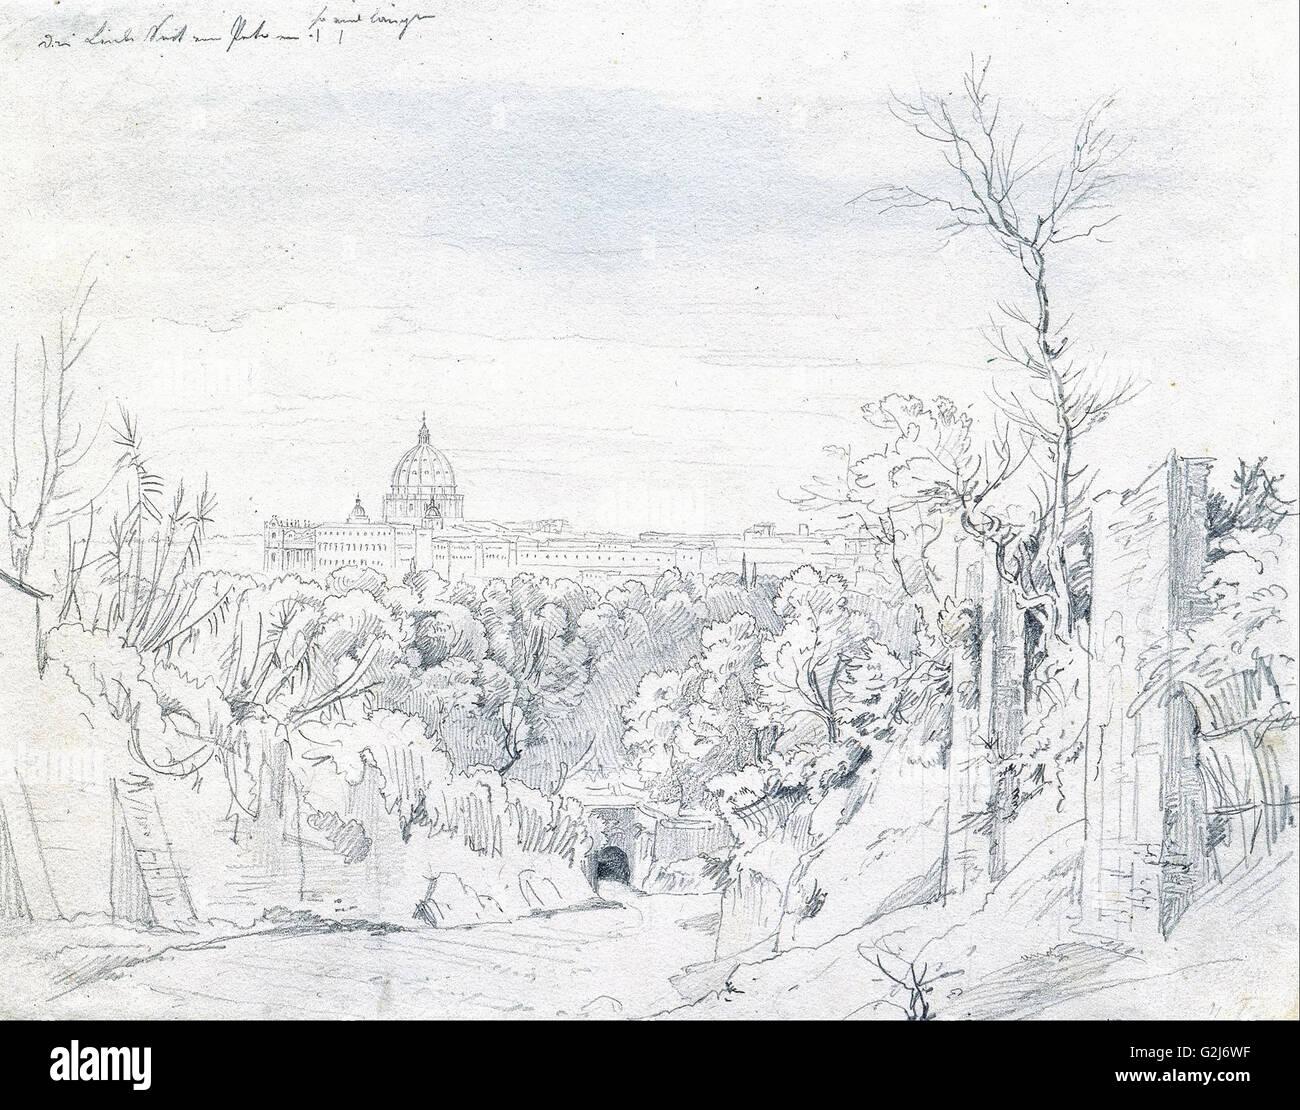 Johann Georg von Dillis - View of Saint Peter's Basilica in Rome - Museum Kunstpalast, Düsseldorf - Stock Image